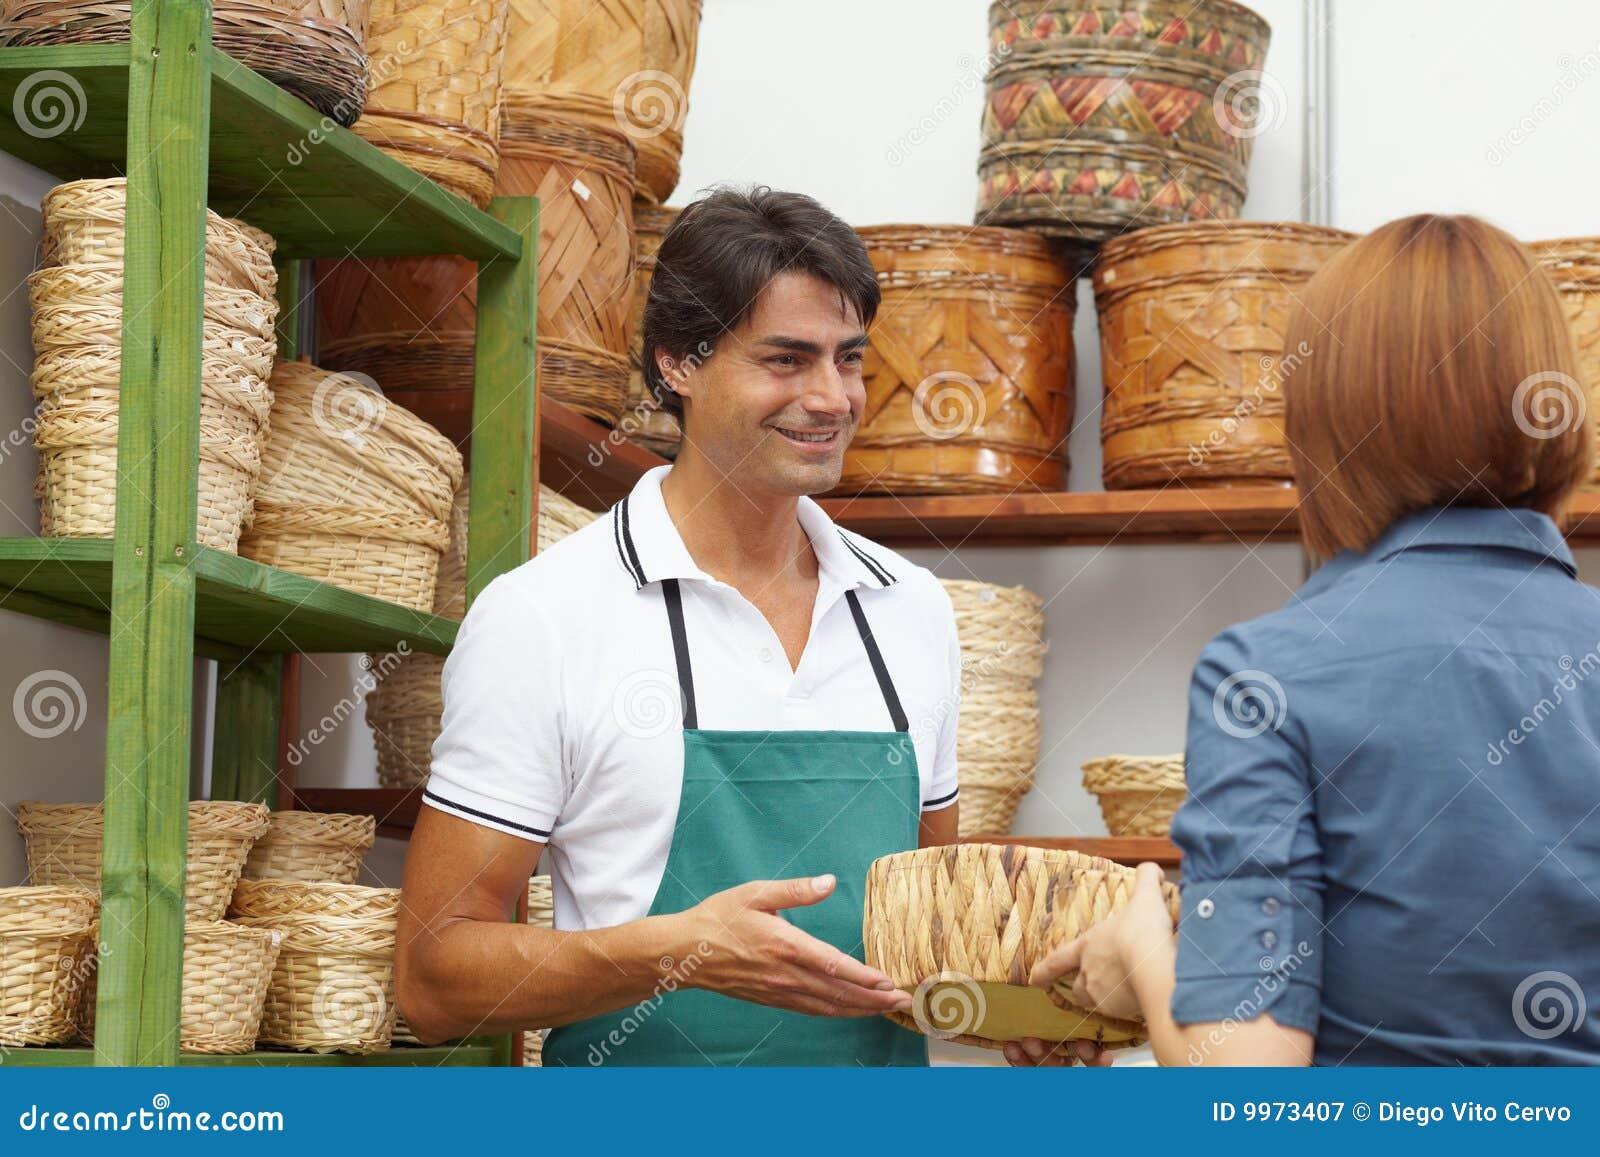 Flower shop shopping woman